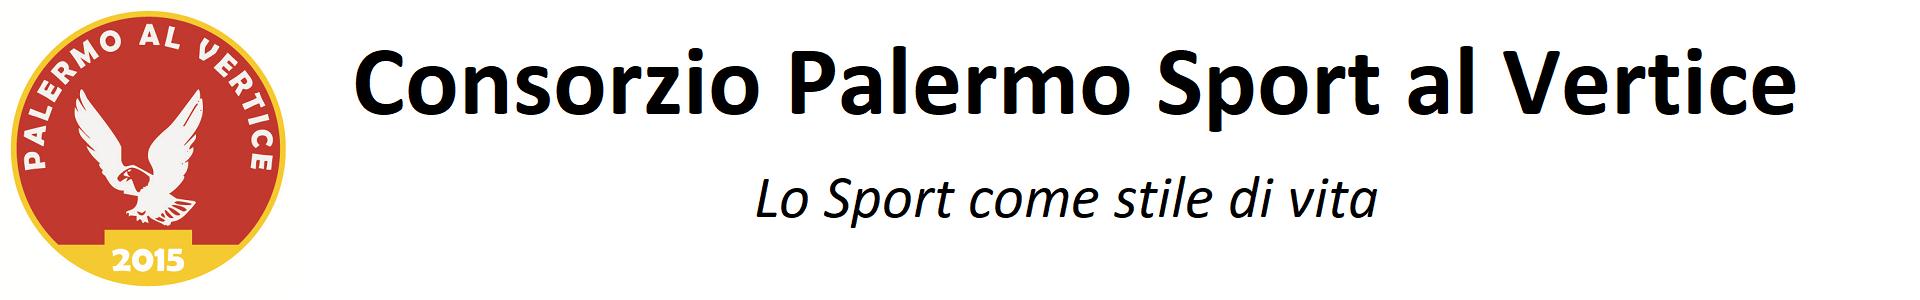 Consorzio Palermo Sport al Vertice